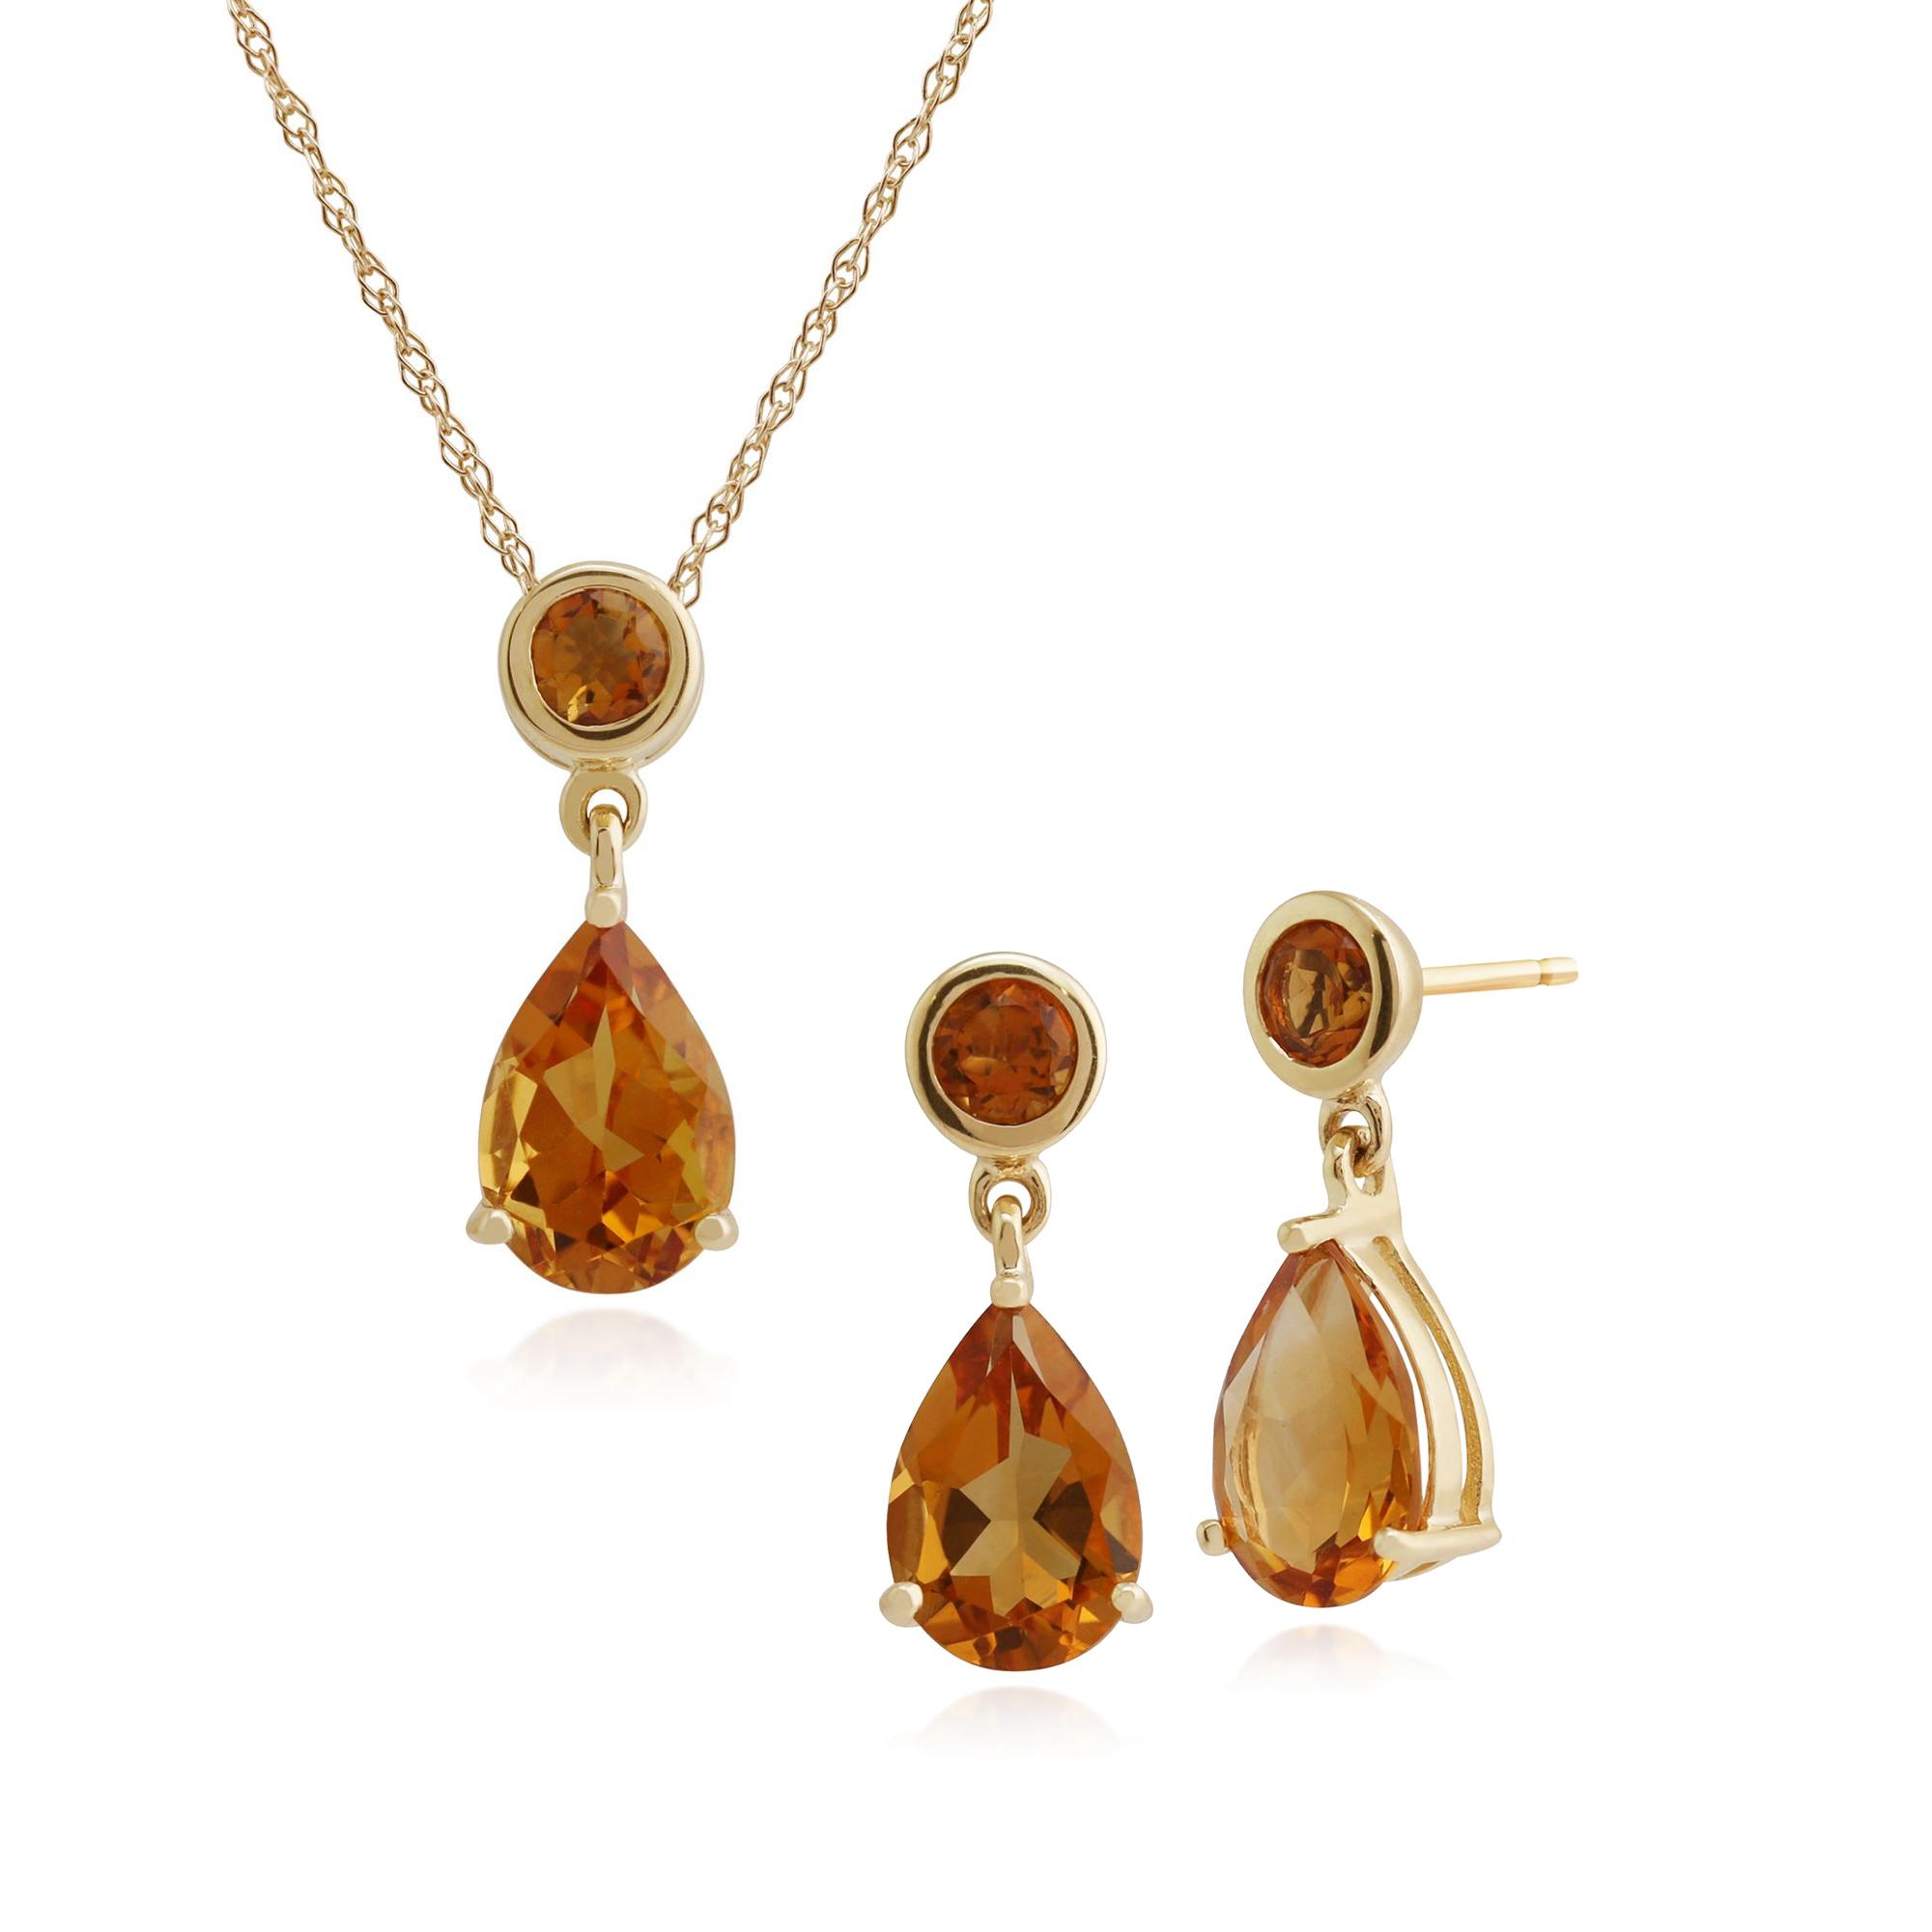 "/""JJ/"" Jonette Jewelry Brite Silver Pewter /'USA/' Tac Pin ~ Proud American"